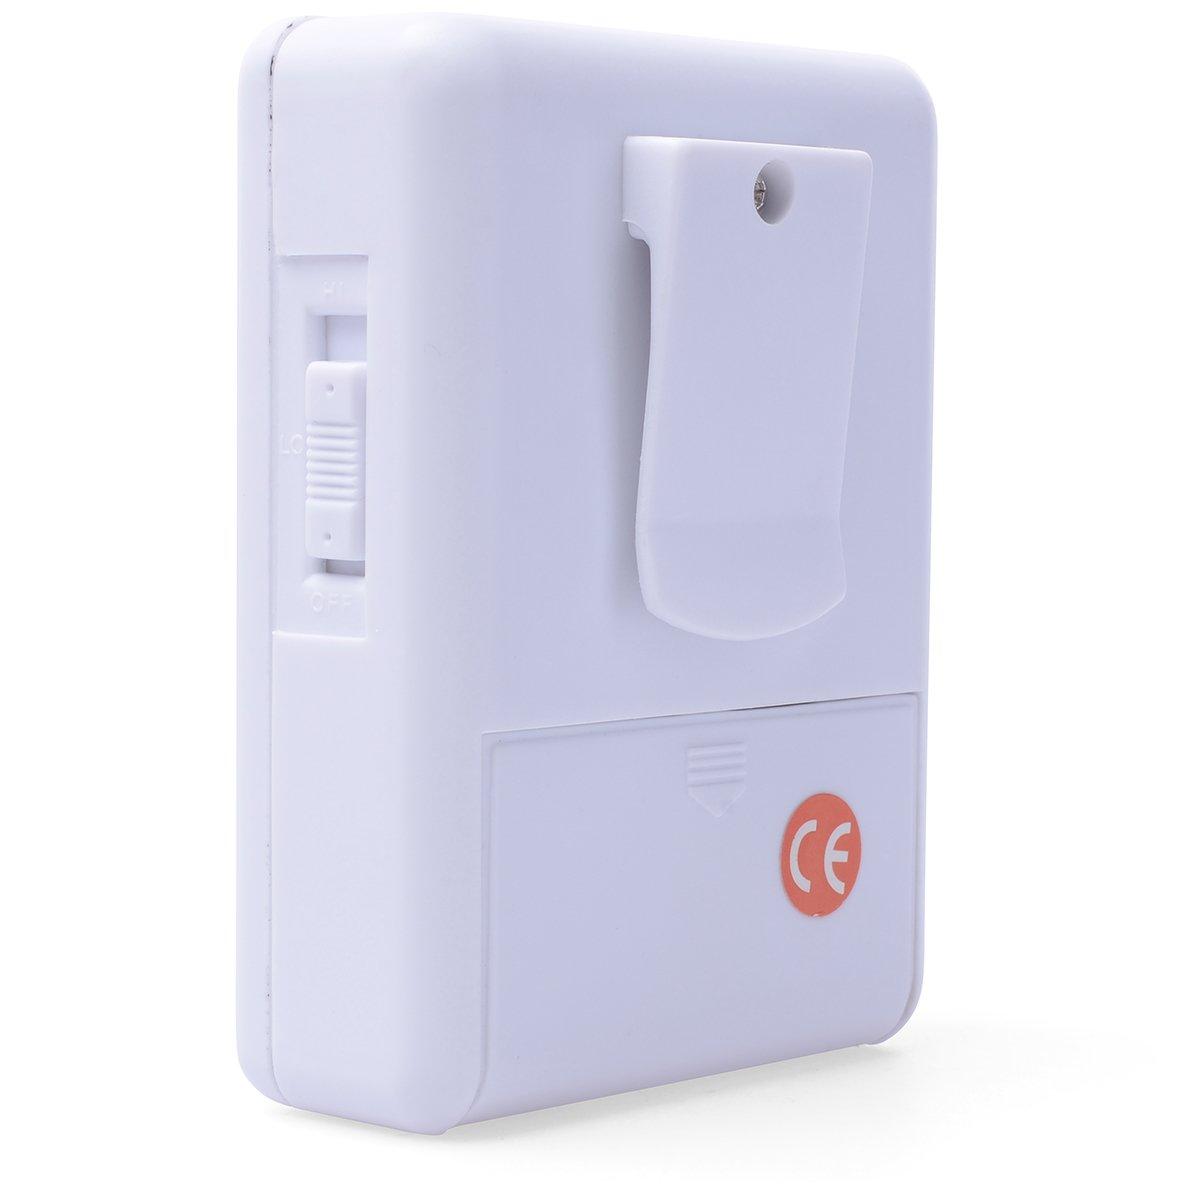 Xcsource Wireless Digital Infrared Monitor Sensor Detector Alarm